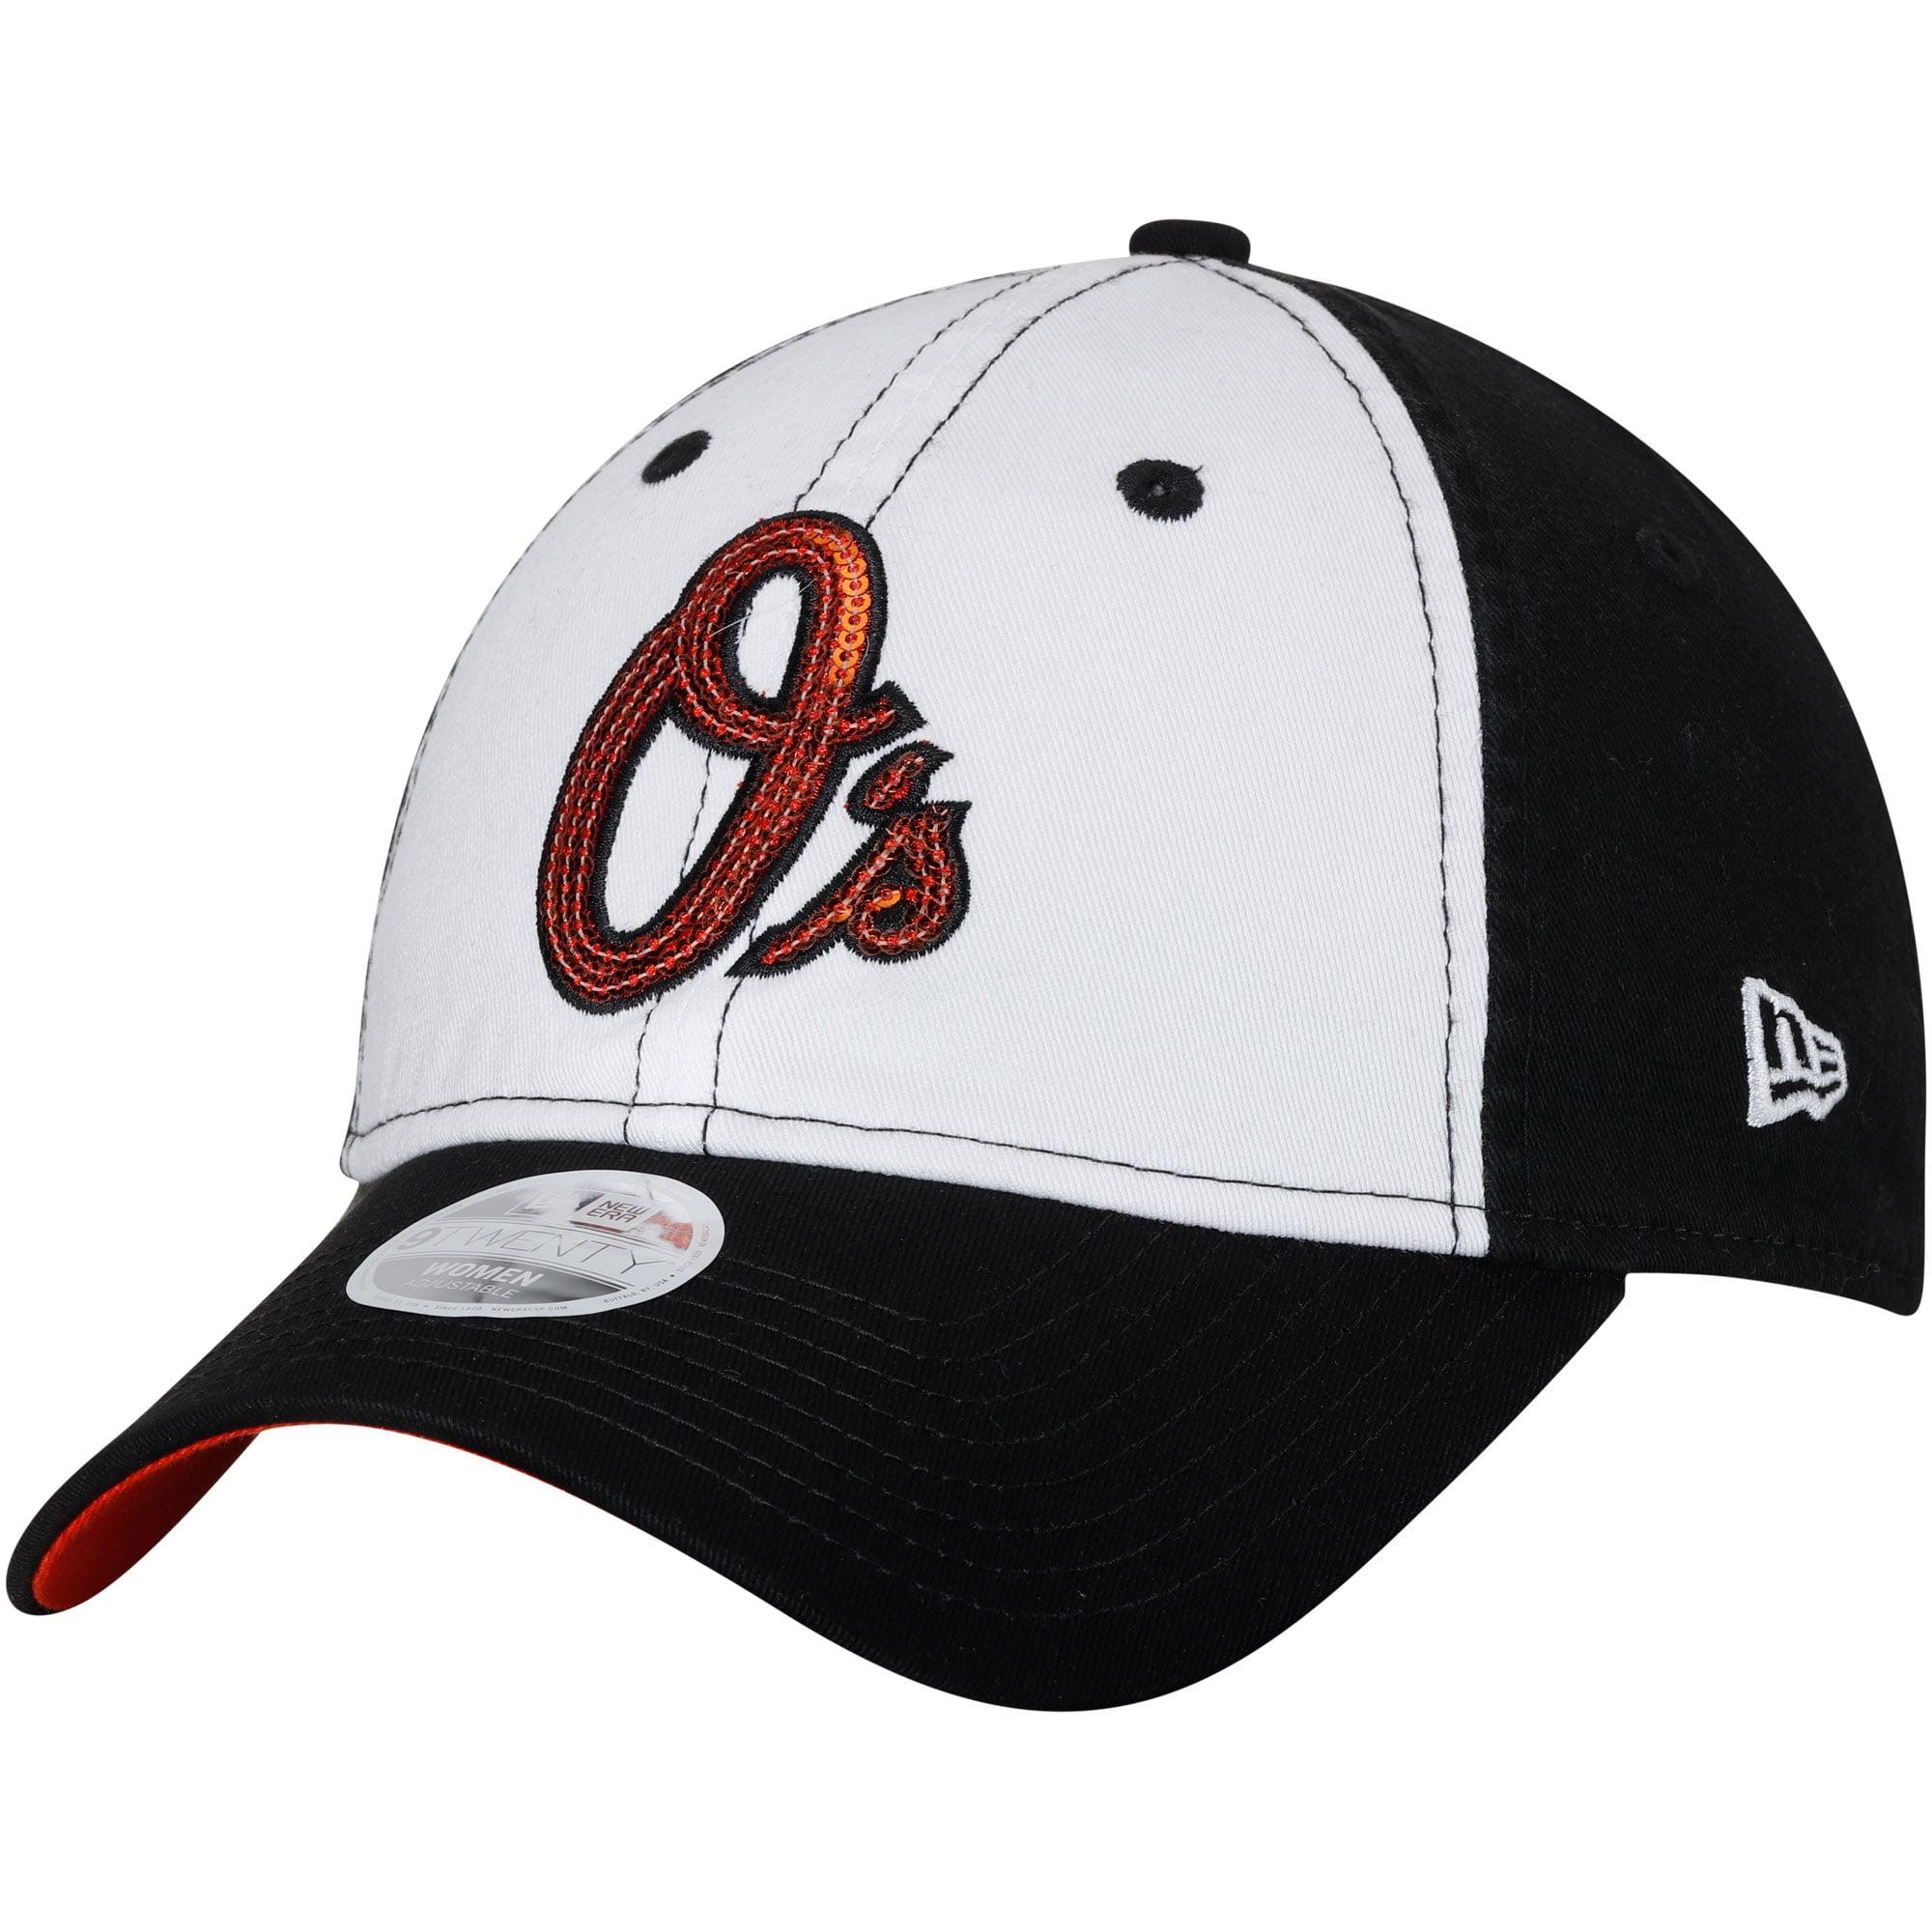 Baltimore Orioles New Era Women's Team Glimmer 9TWENTY Adjustable Hat - White/Black - OSFA